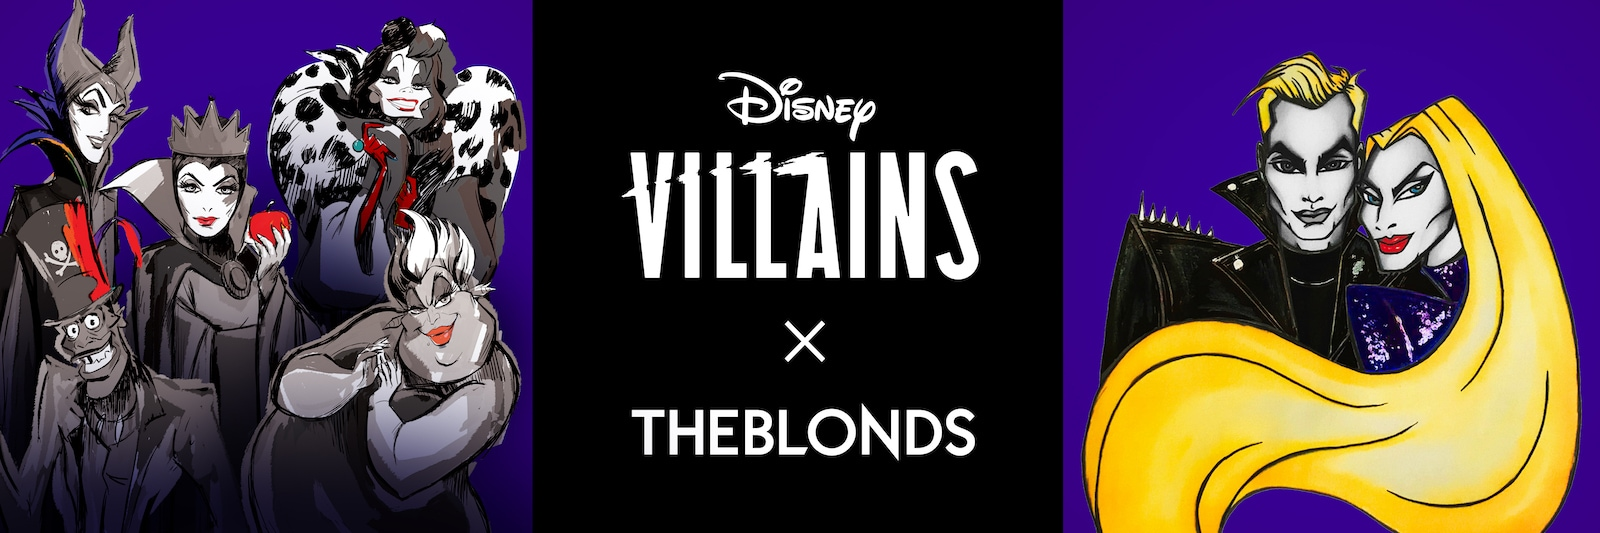 The Blonds x Disney Villains poster